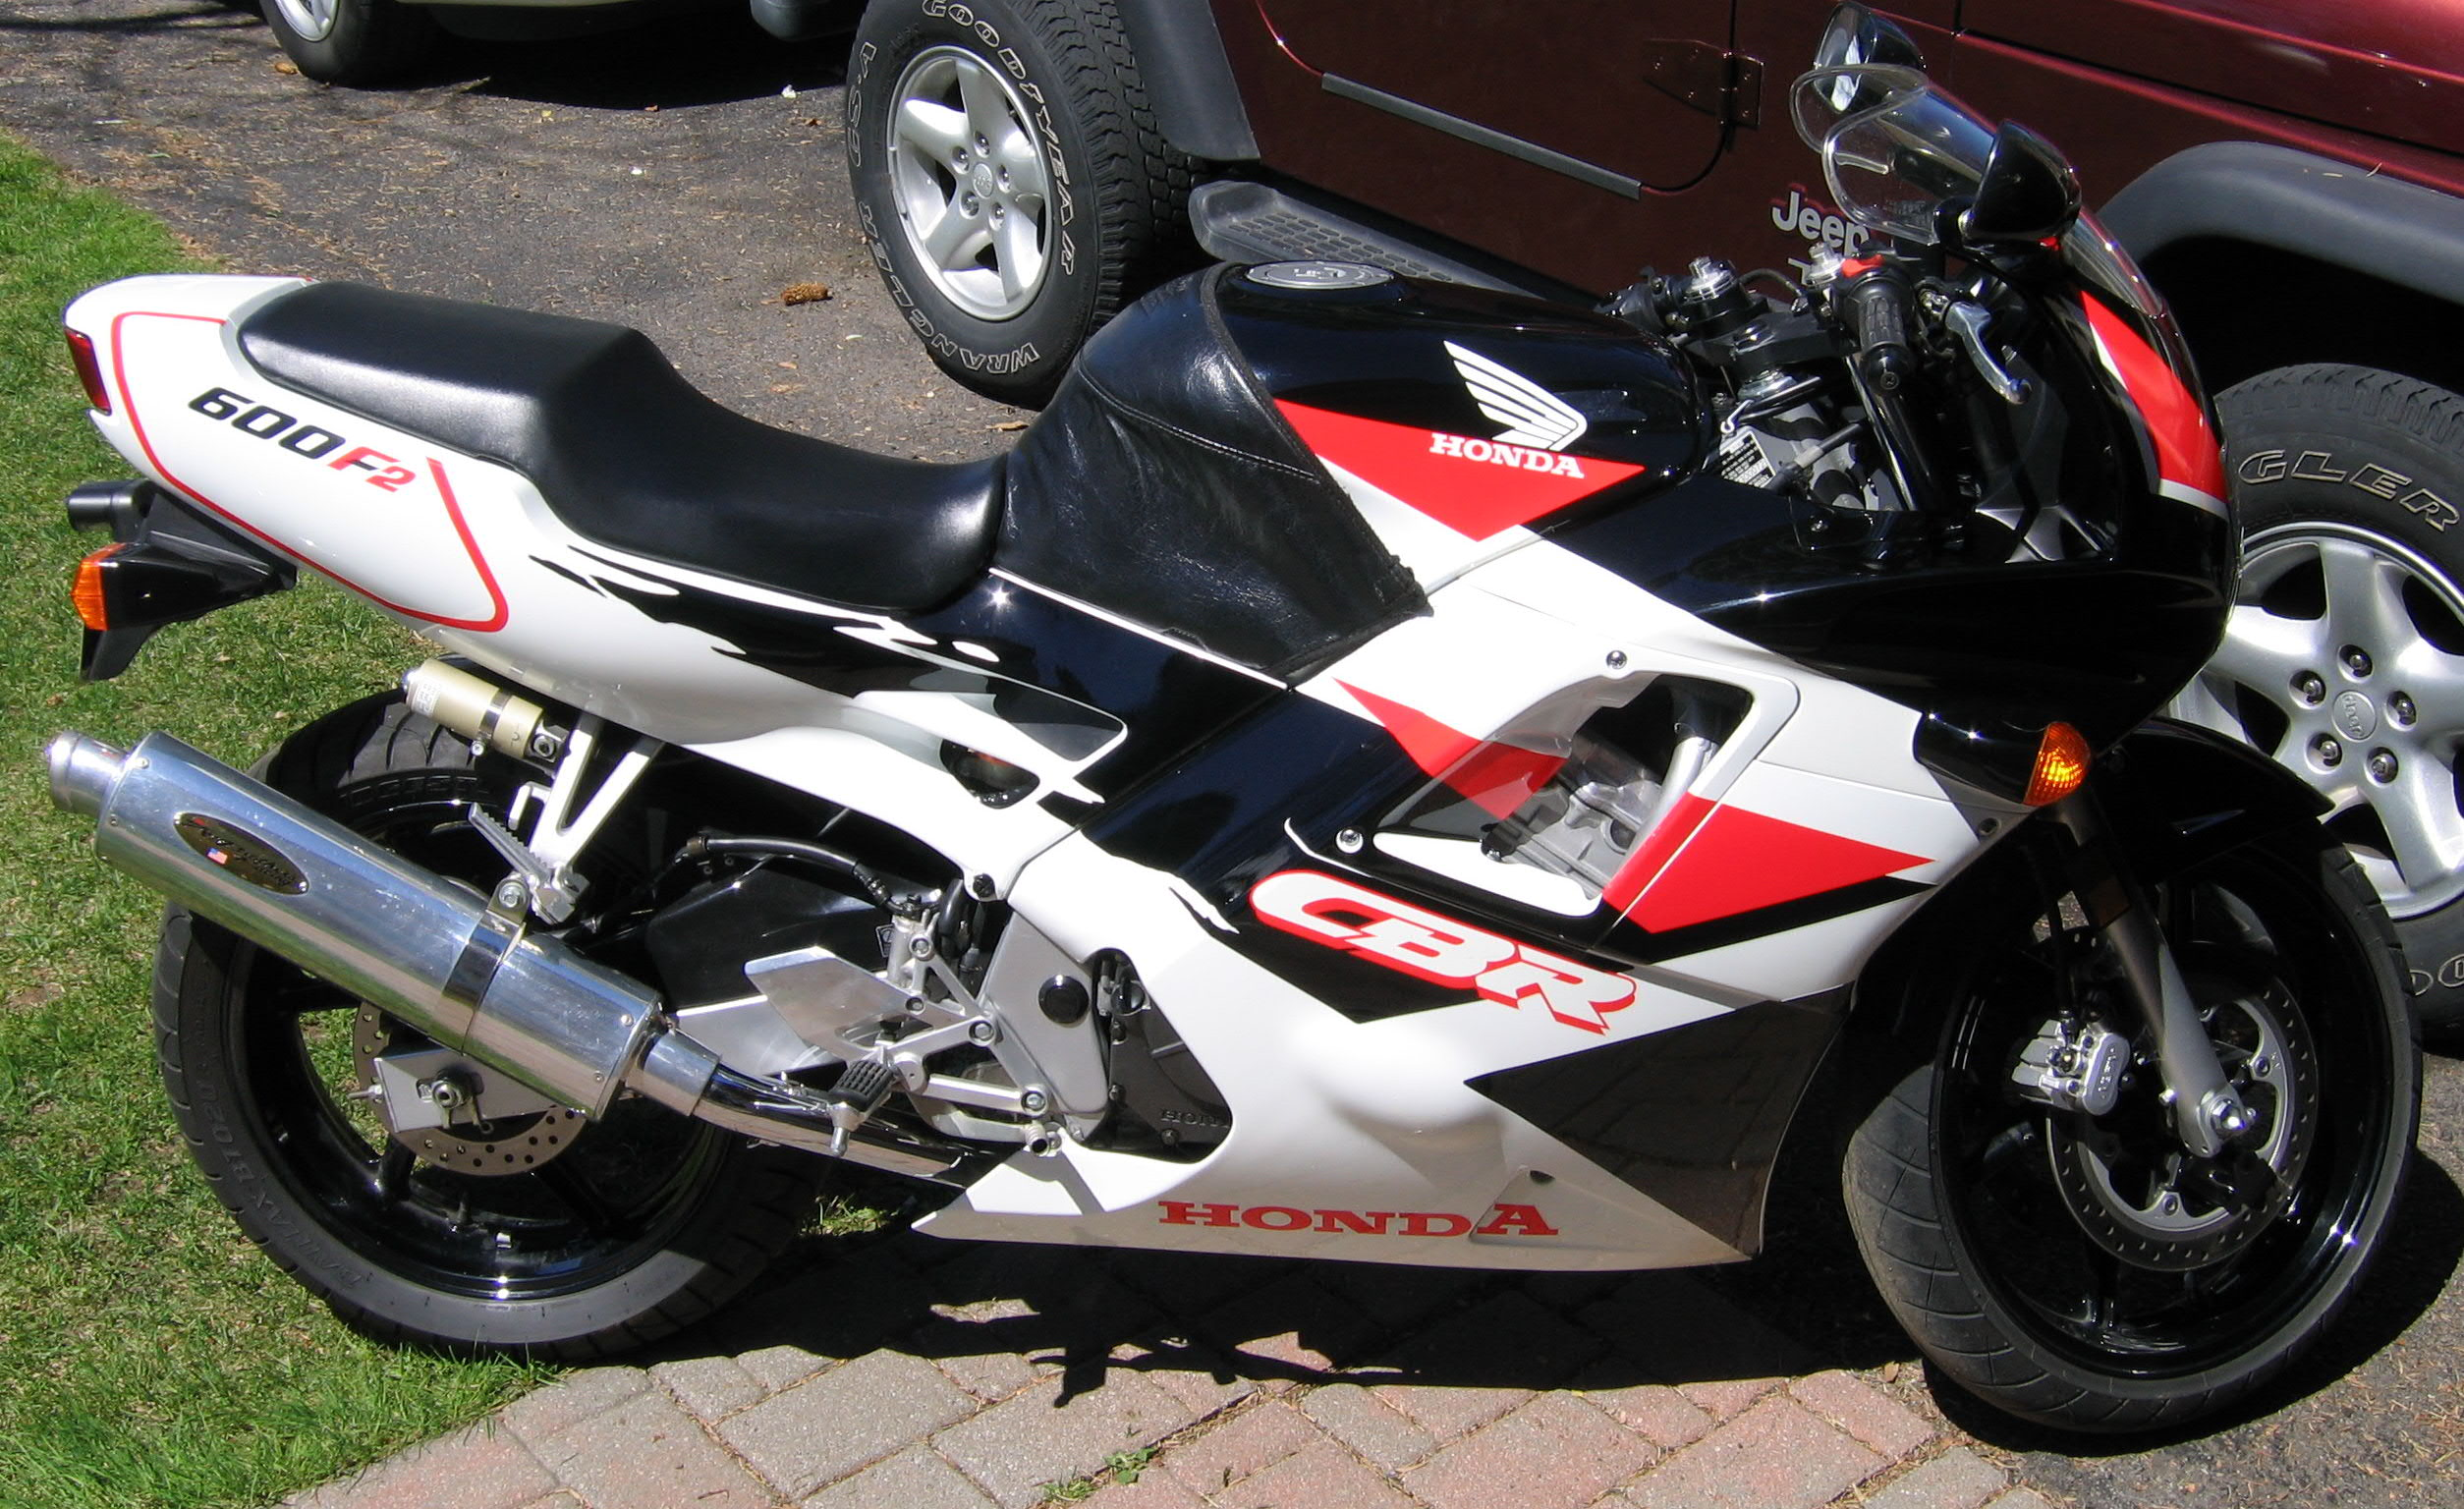 For Sale Honda Cbr600f2 The Bike Market